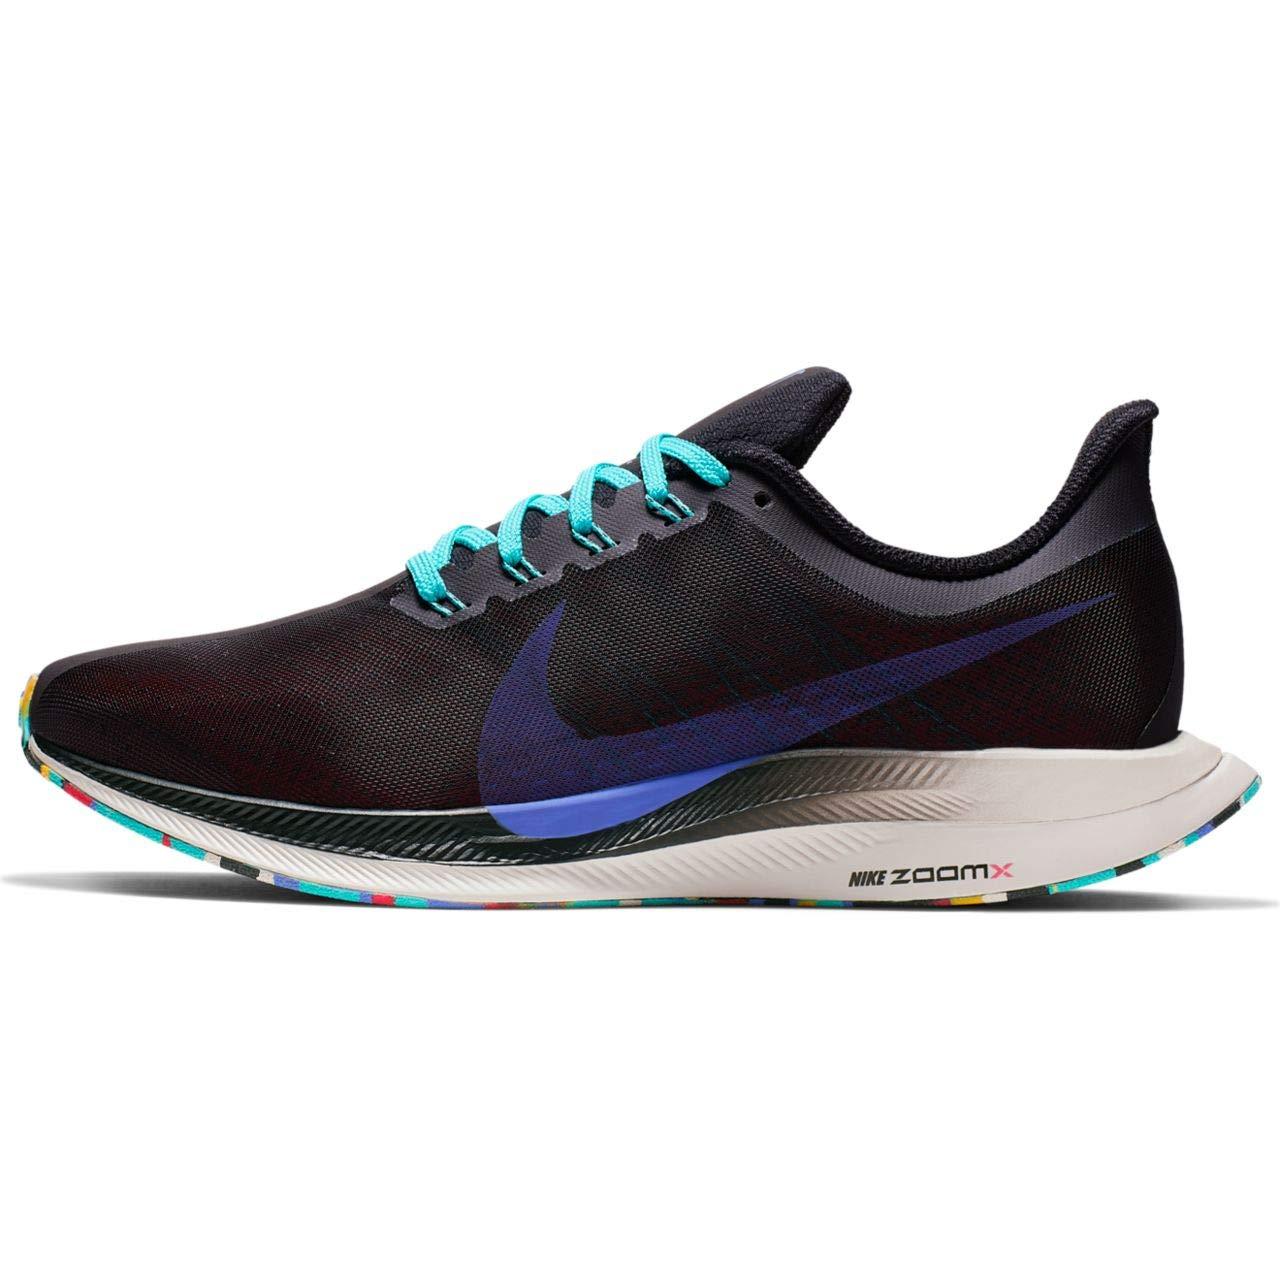 MultiCouleure (noir Sapphire Hyper Jade Ember GFaible 000) 35.5 EU Nike W Zoom Pegasus 35 Turbo, Chaussures d'Athlétisme Femme